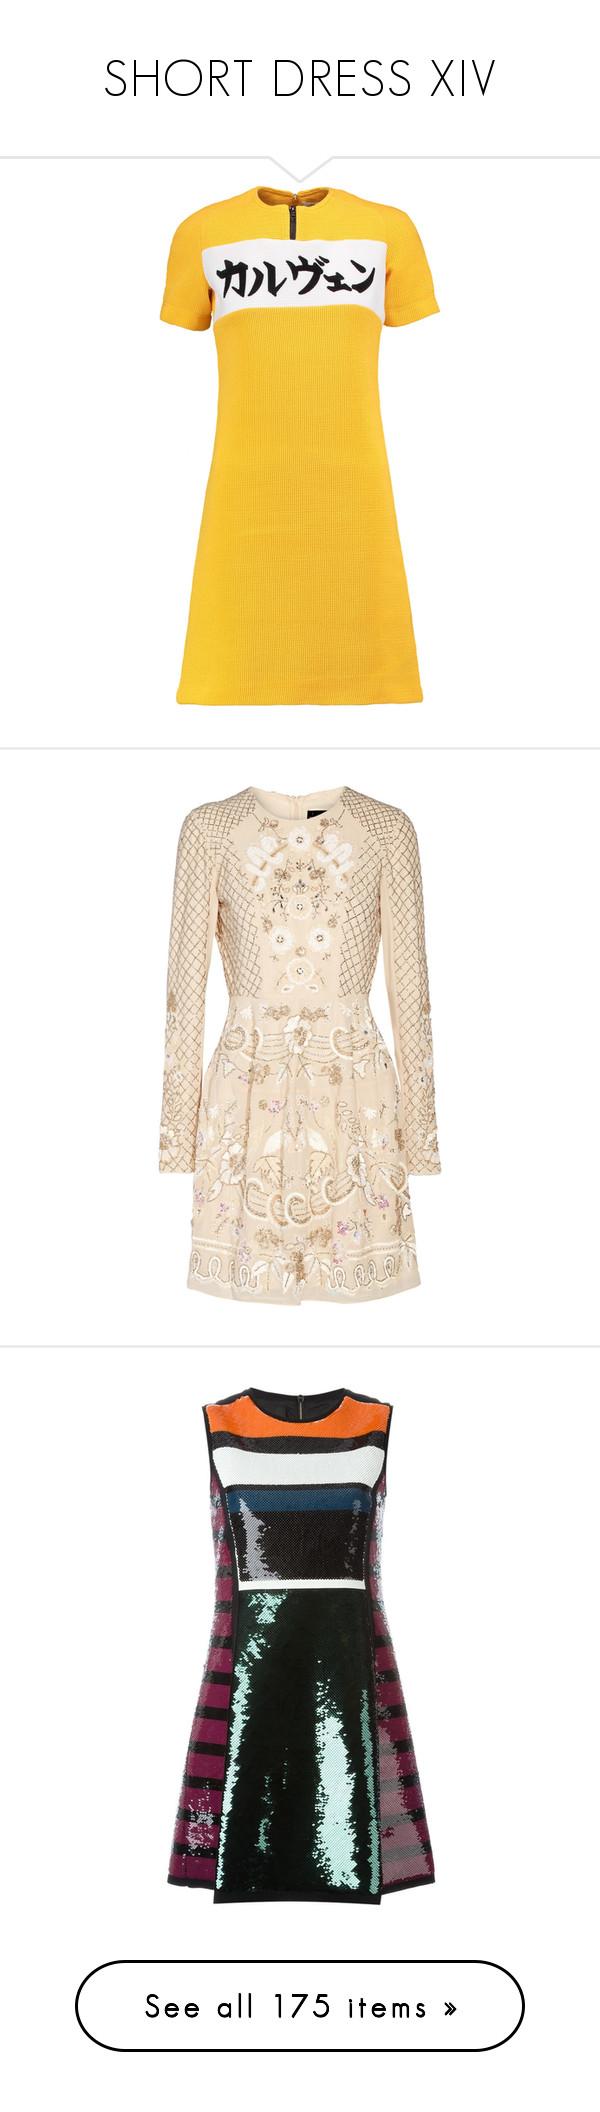 Short dress xiv